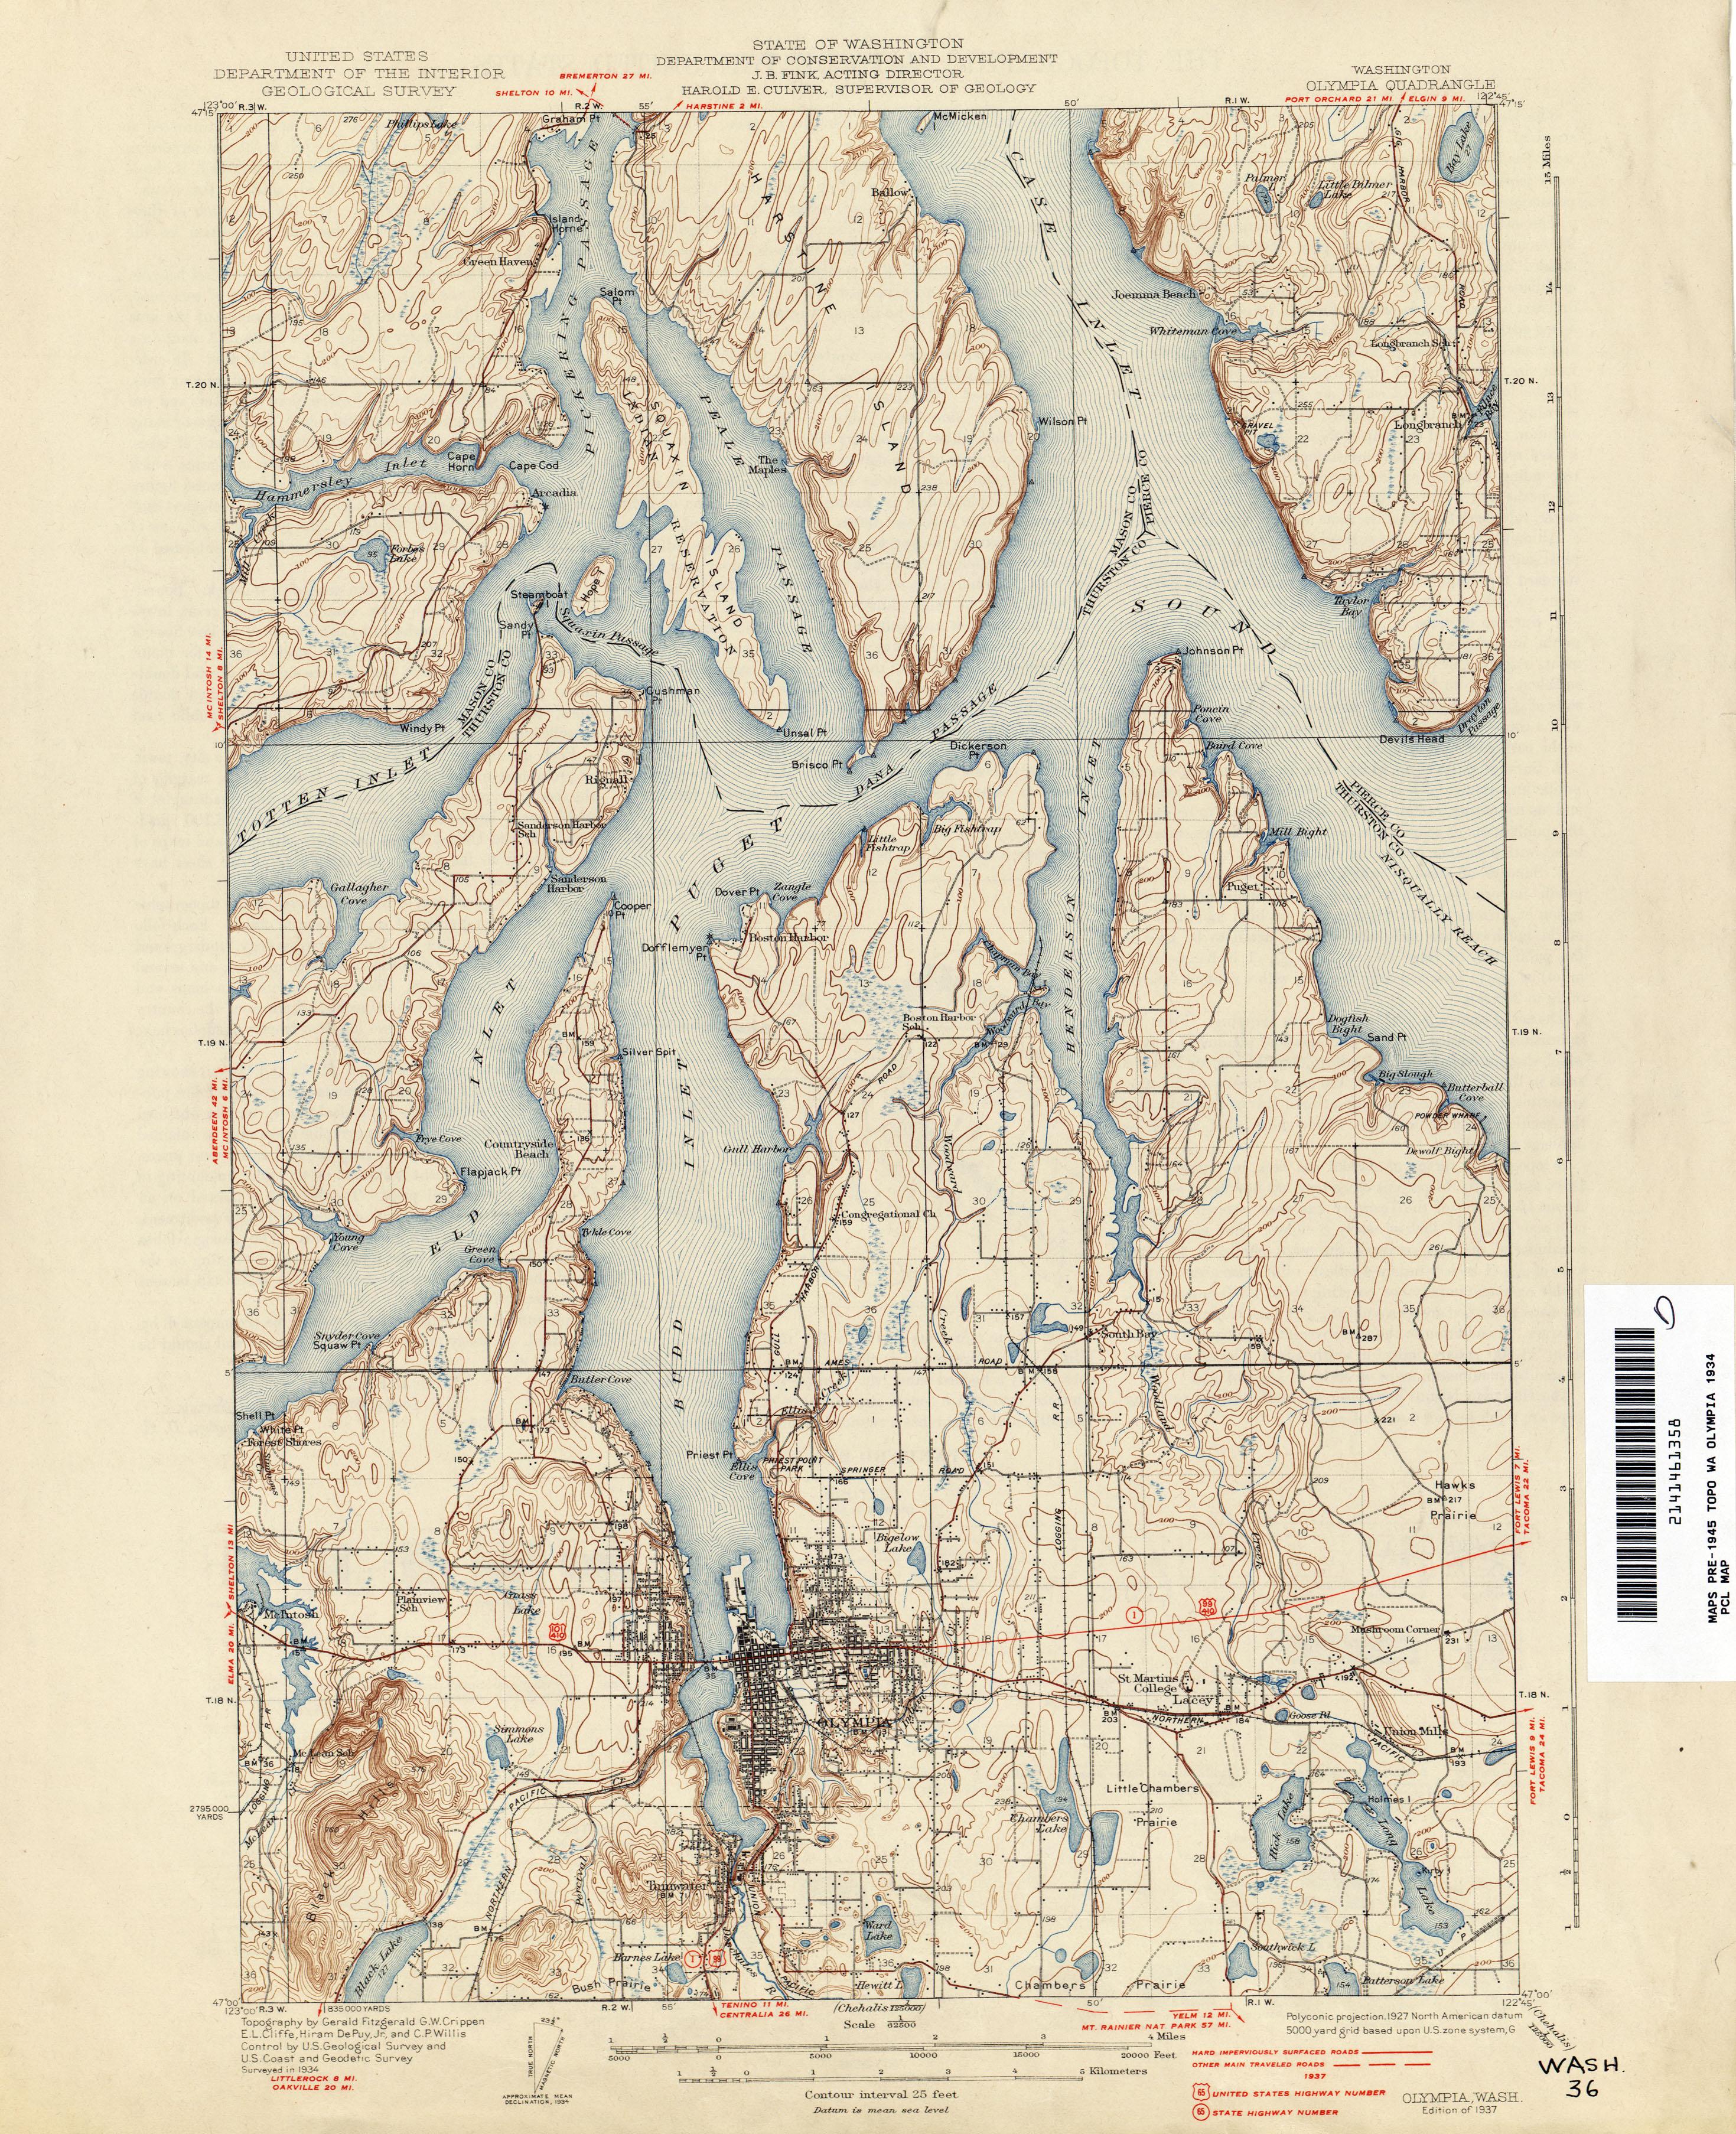 Washington Historical Topographic Maps - Perry-Castañeda Map ...